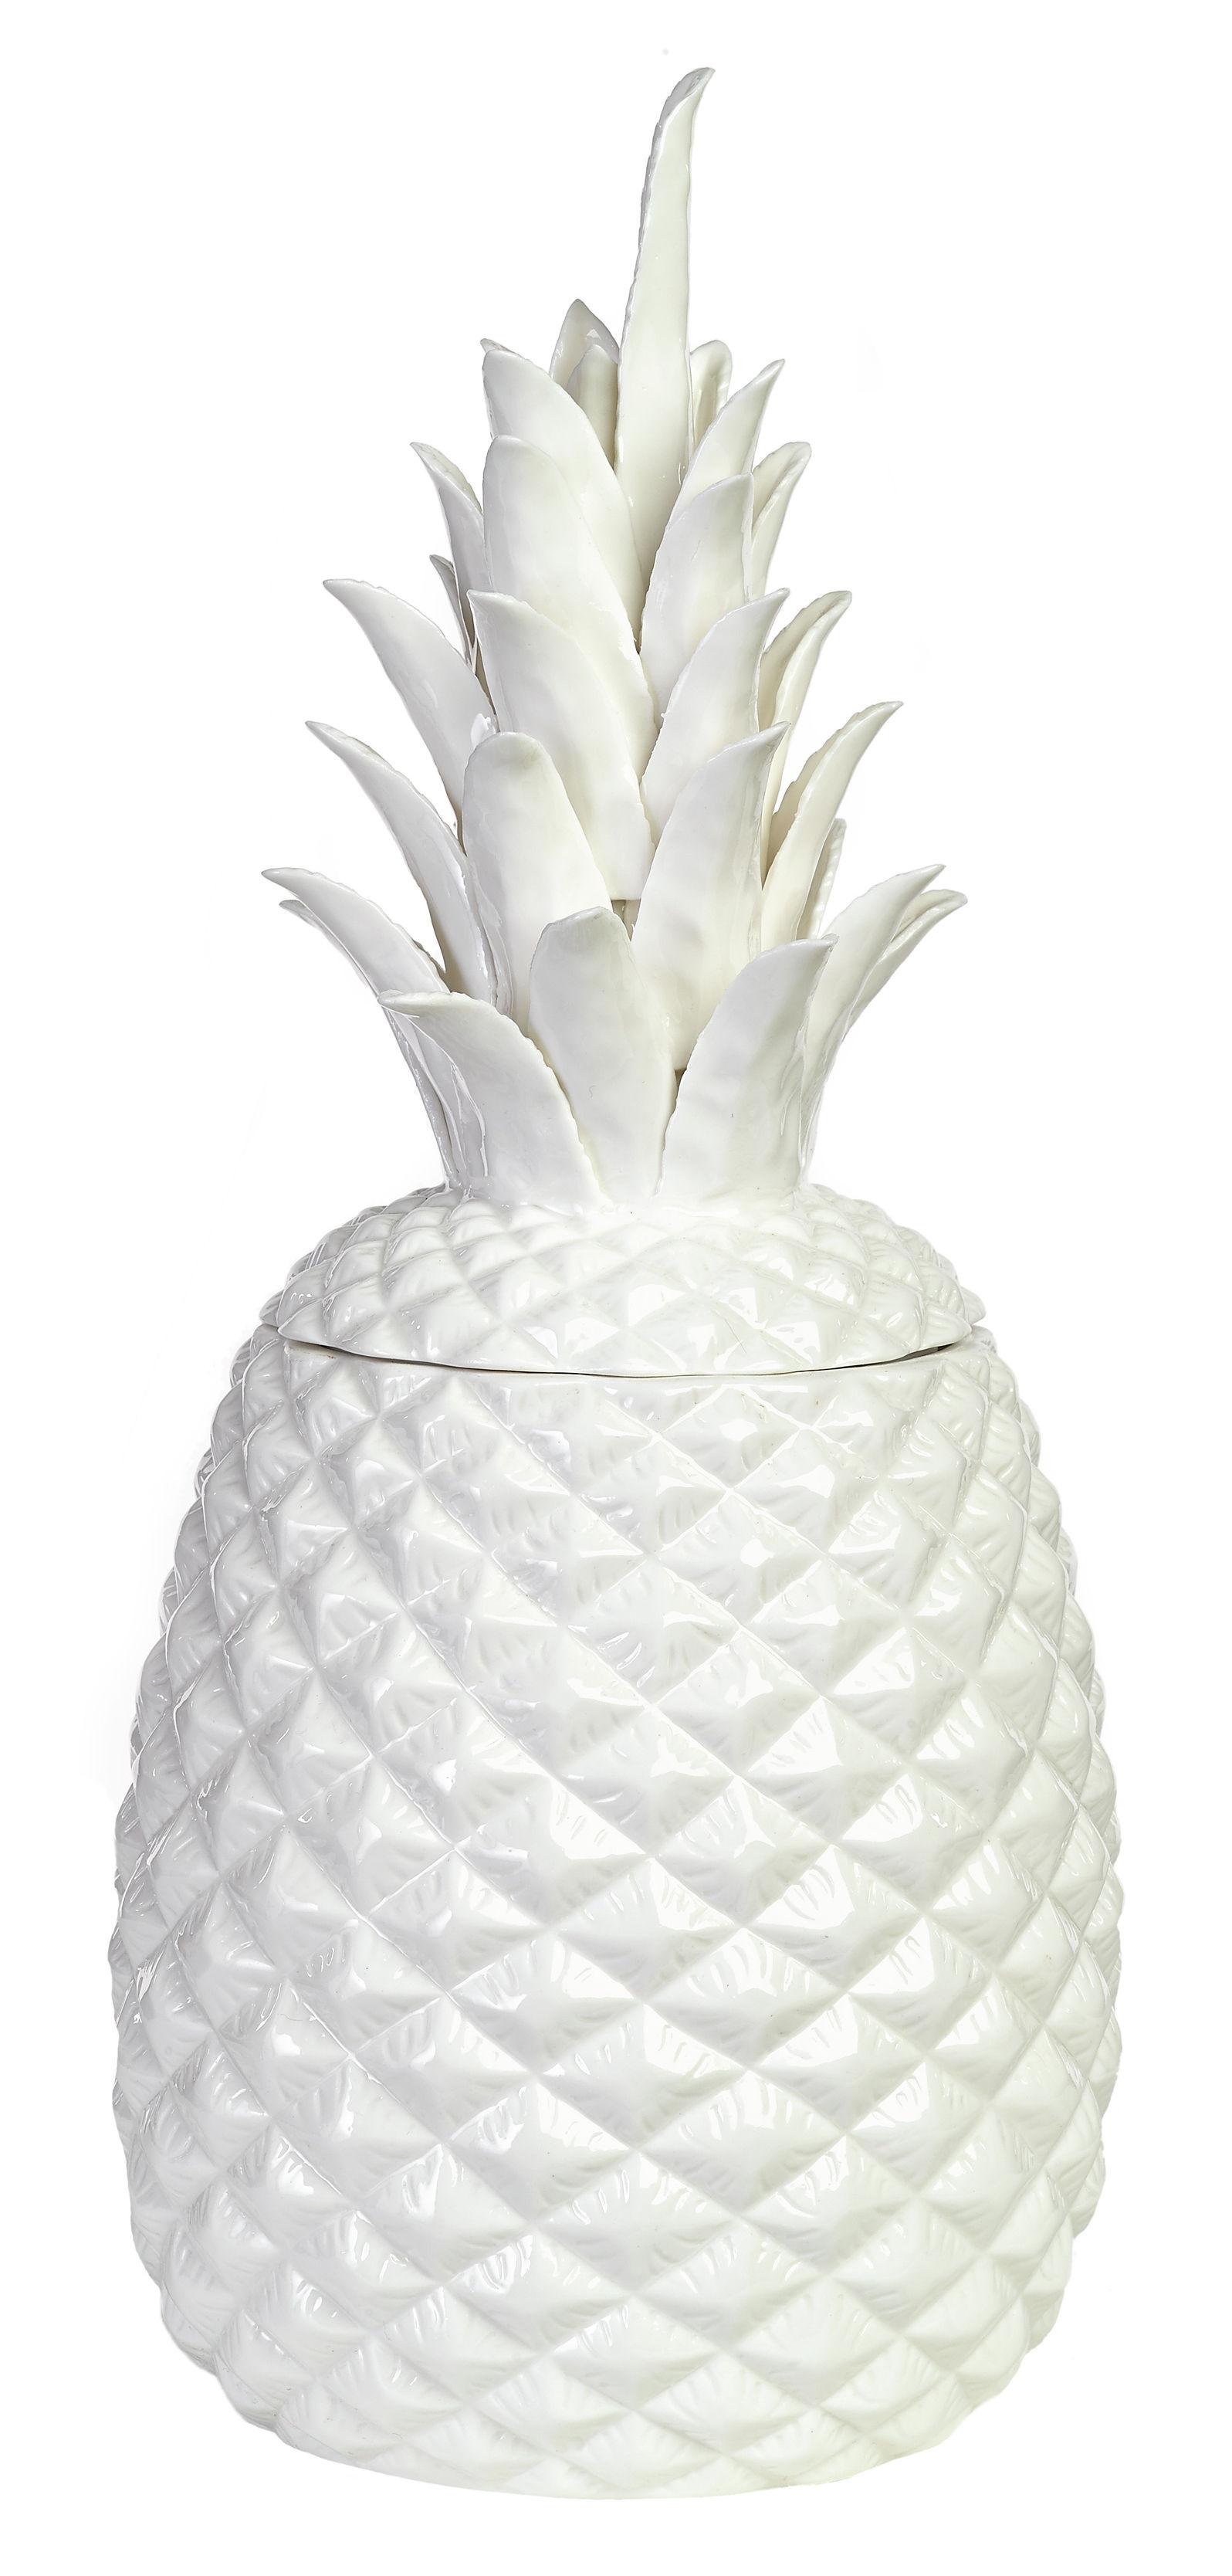 Interni - Scatole déco - Scatola Pineapple Large / Ø 18 x H 39 cm - Porcellana - Pols Potten - Bianco - Porcellana smaltata